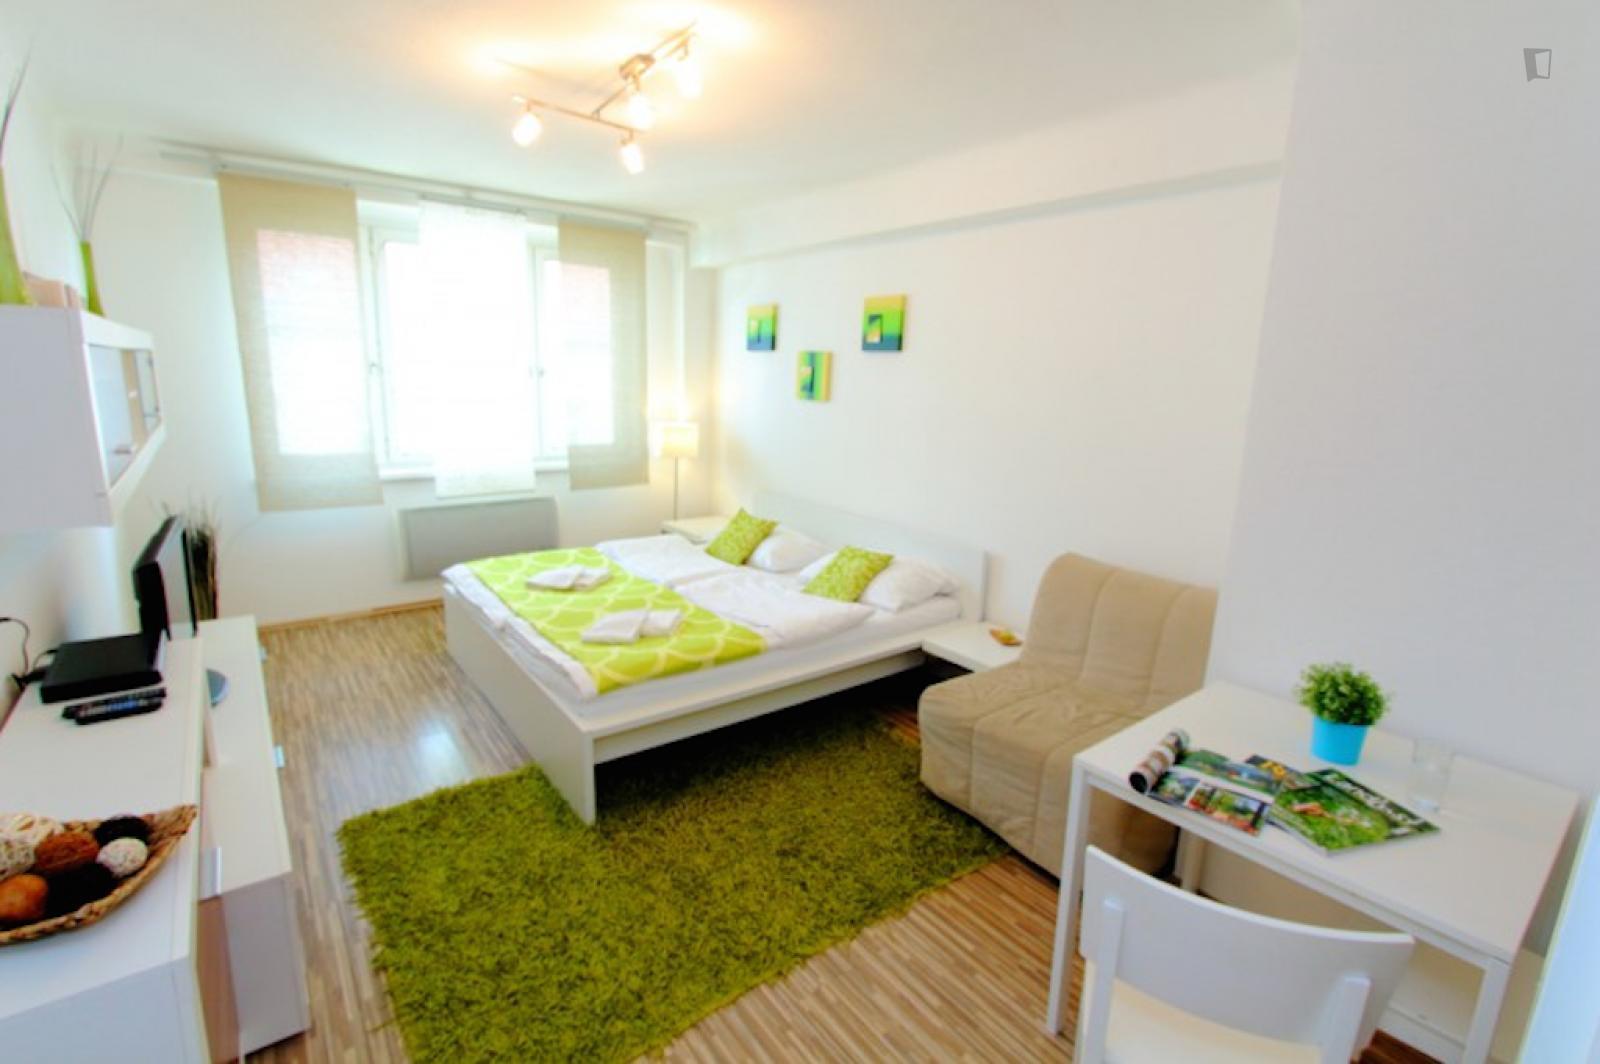 Kriehubergasse, Margareten, AT-9 - 1,350 EUR/ month